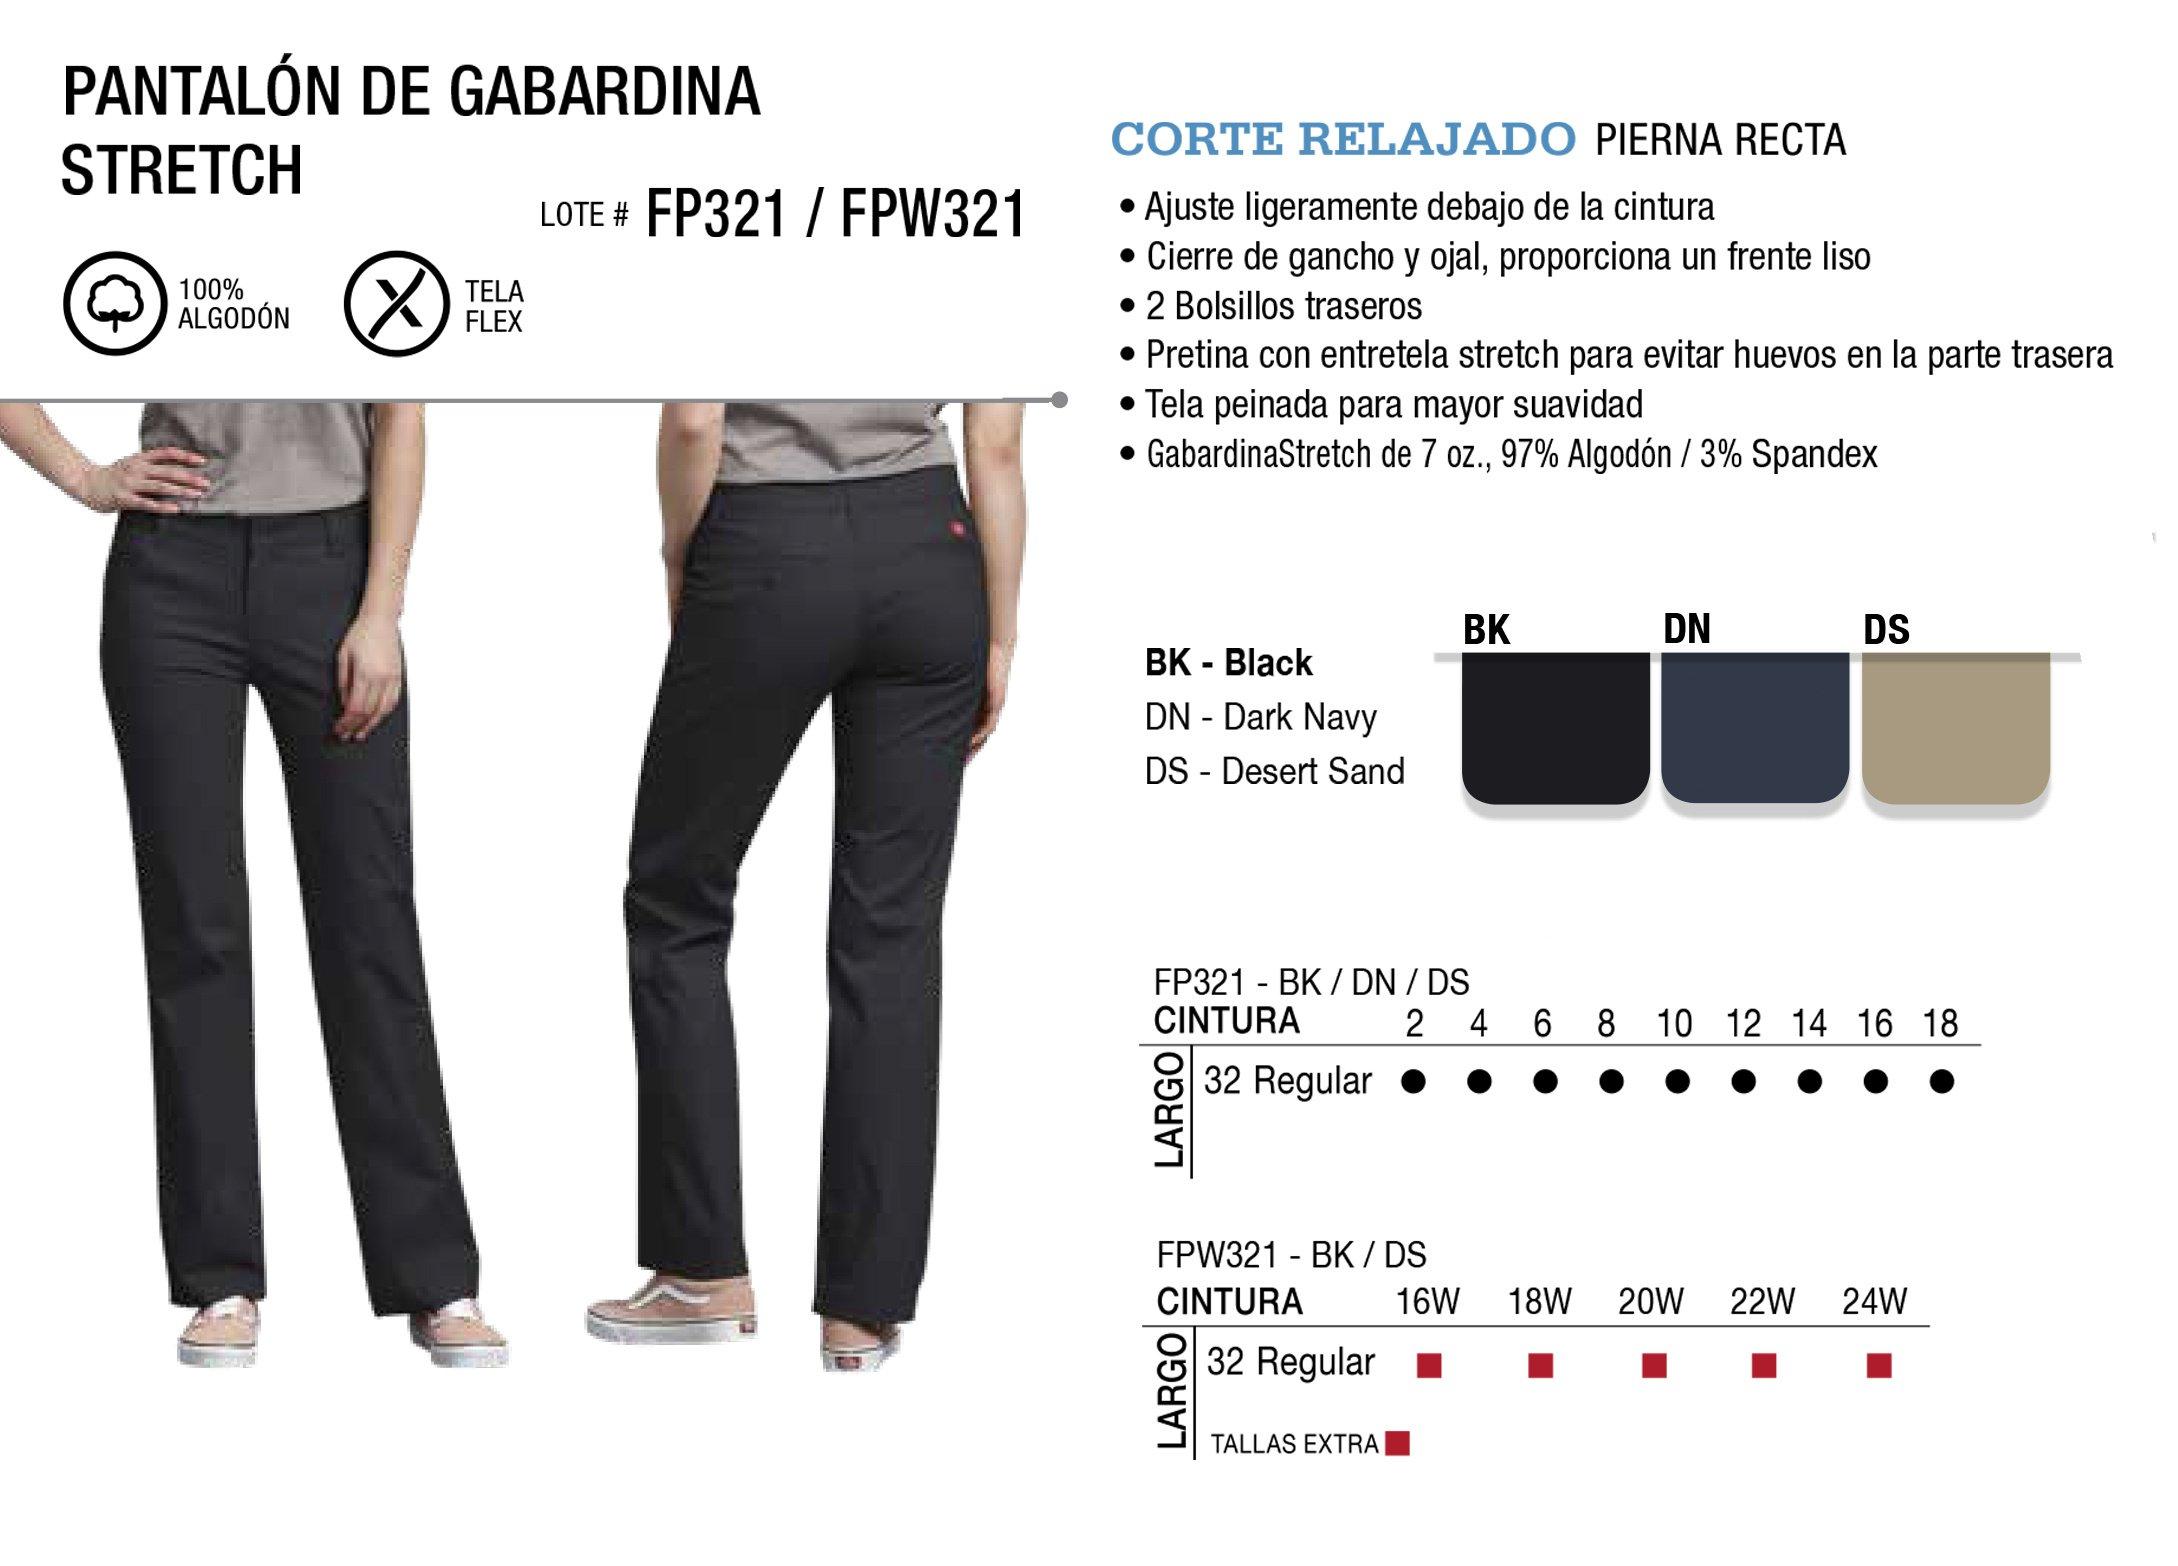 Pantalón de Gabardina Stretch. Corte Relajado. FP321/FPW321.